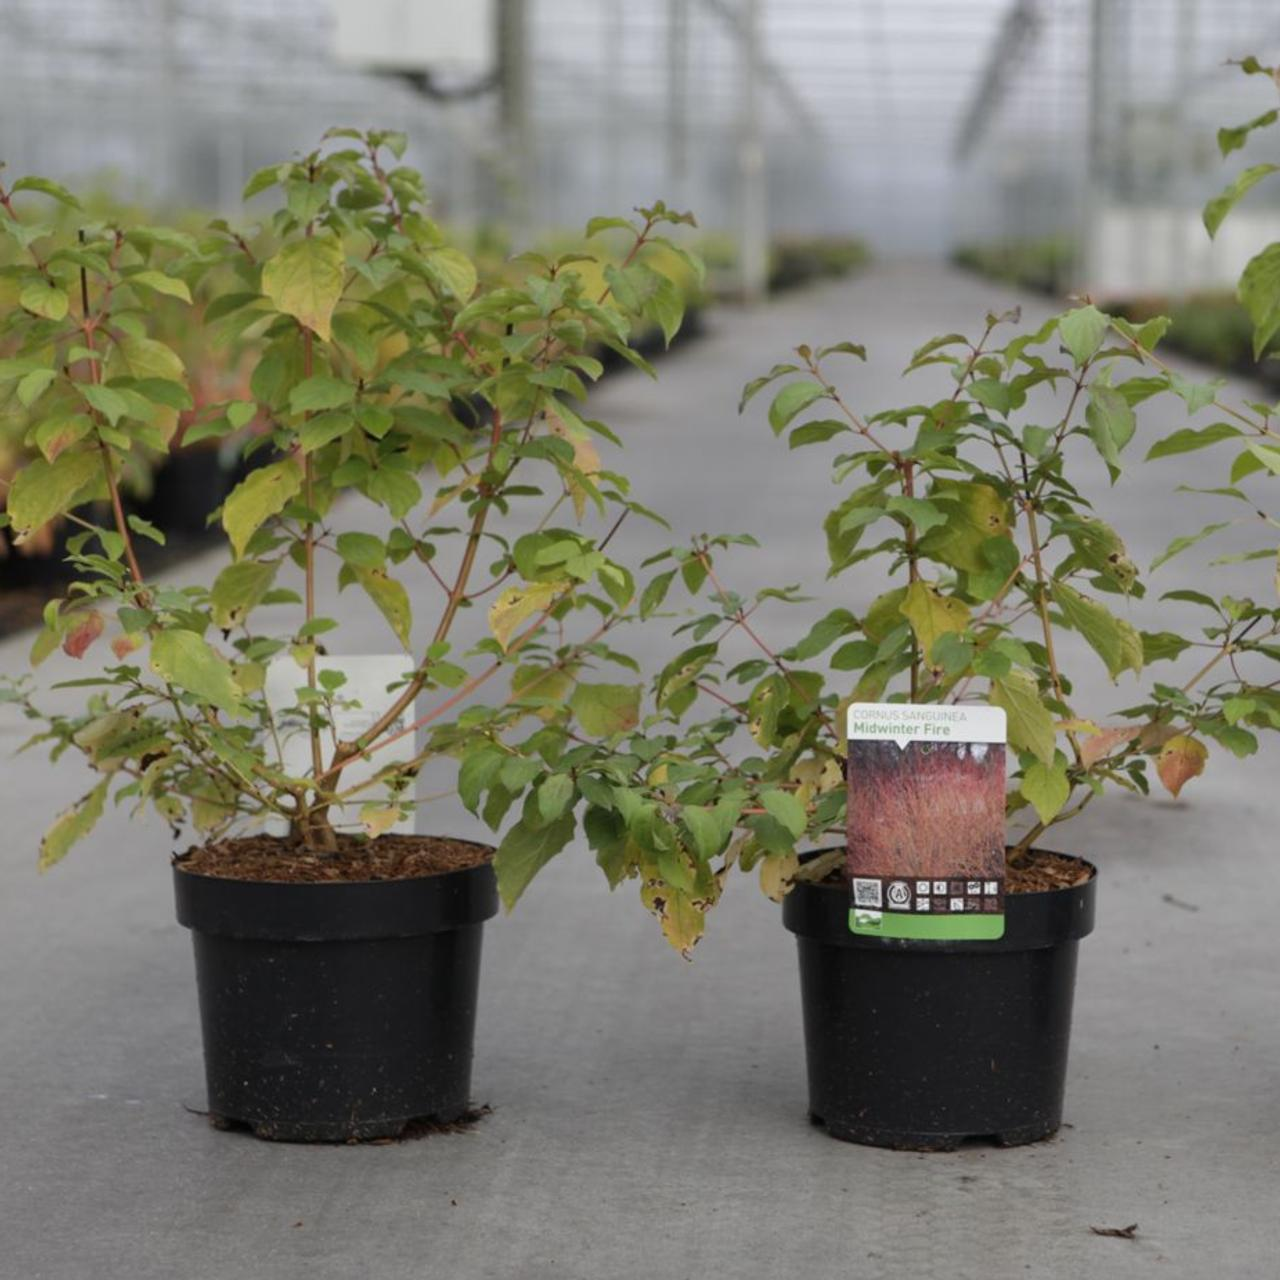 Cornus sanguinea 'Midwinter Fire' plant